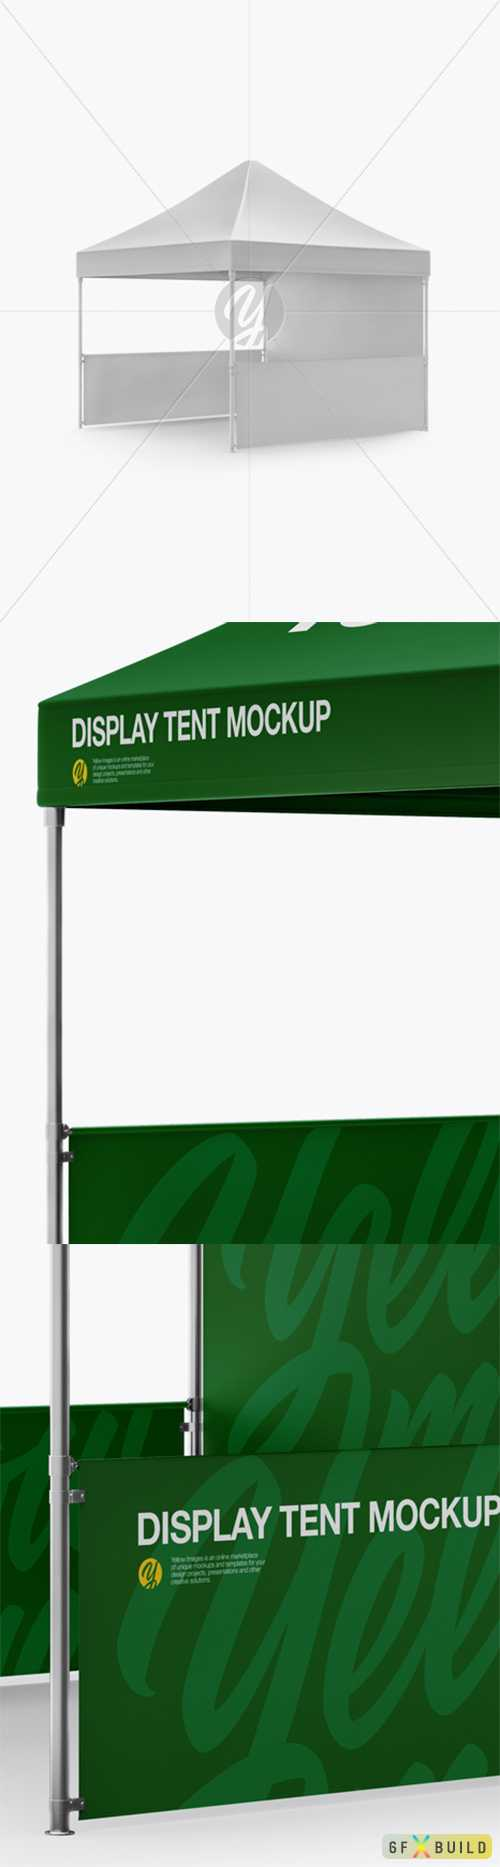 Display Tent Mockup - Half Side View 30574 TIF